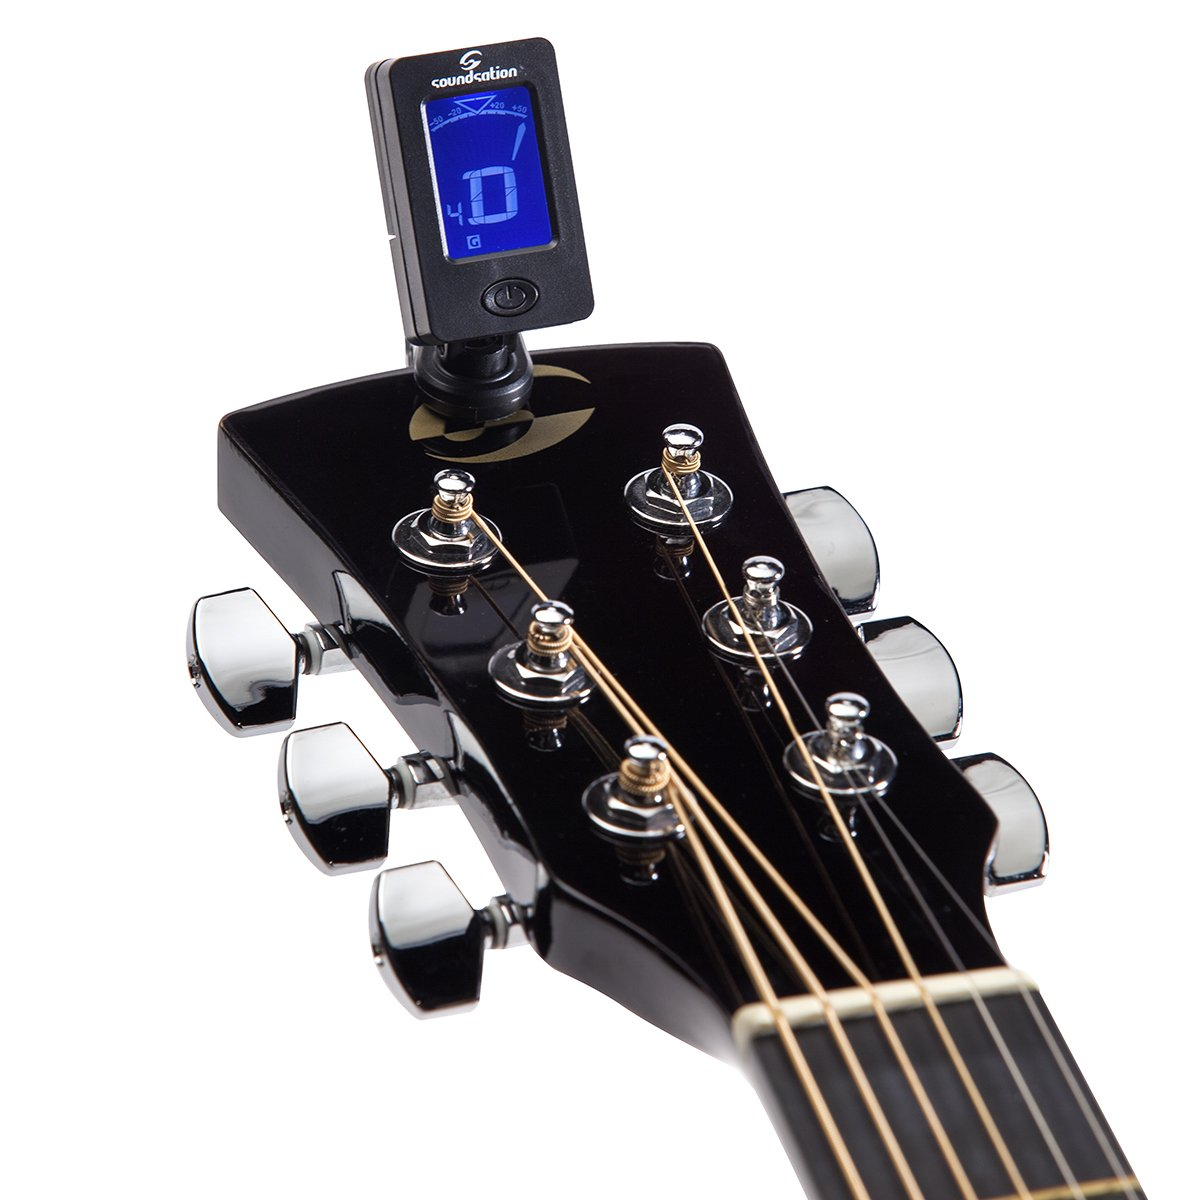 Guitarra Acústica SOUNDSATION Guitar Pack Sónico yosemite-gp-nt con funda Afinador púas i954i: Amazon.es: Instrumentos musicales